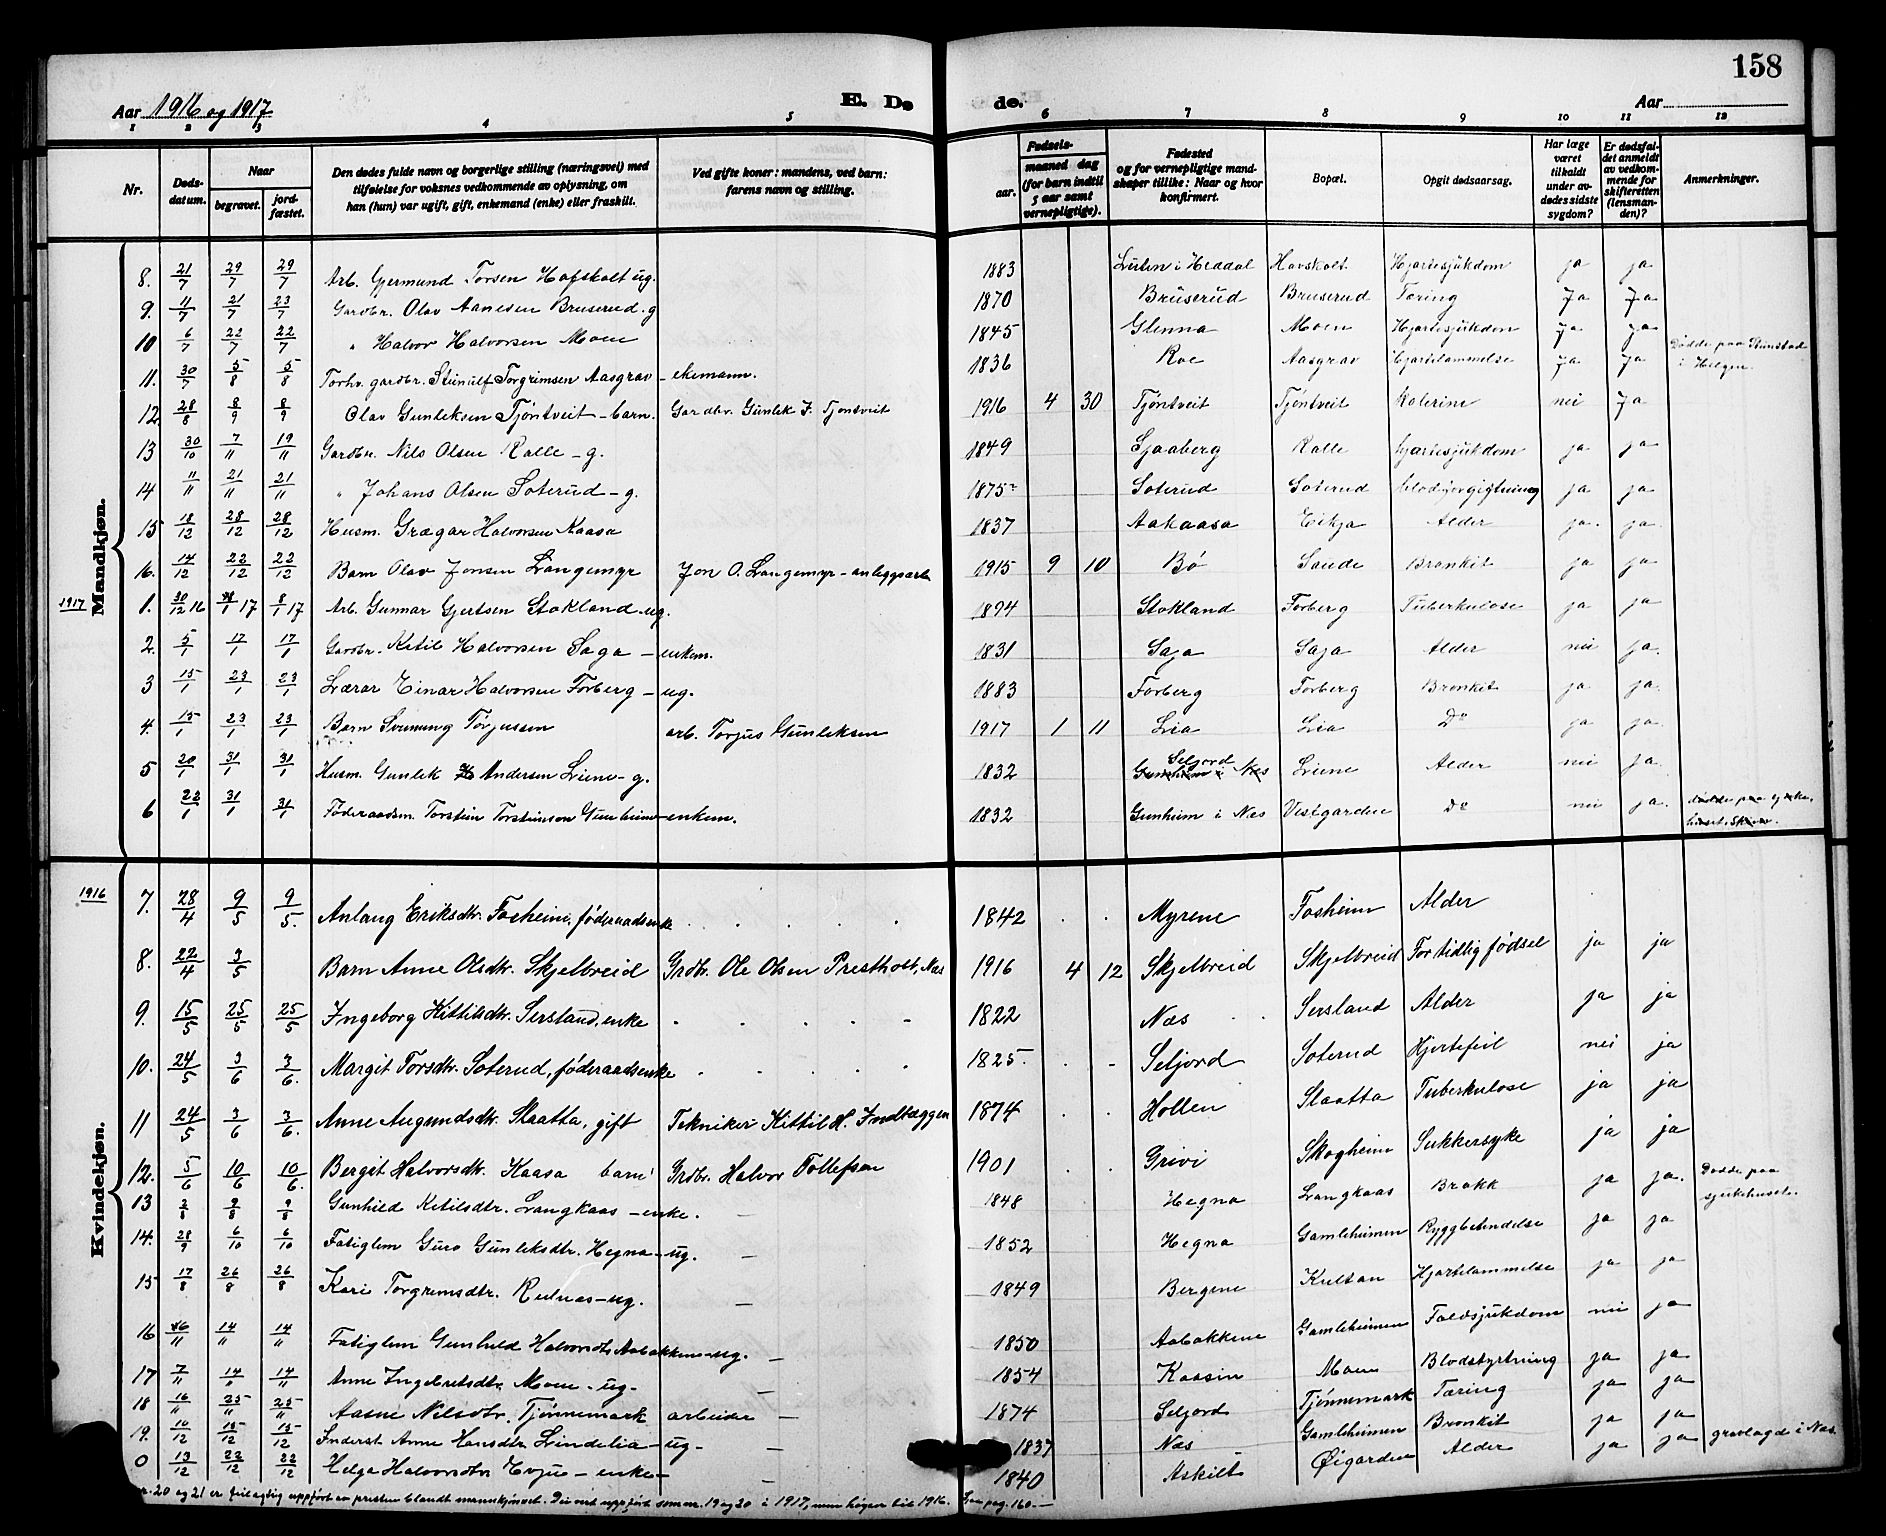 SAKO, Bø kirkebøker, G/Ga/L0007: Klokkerbok nr. 7, 1909-1924, s. 158